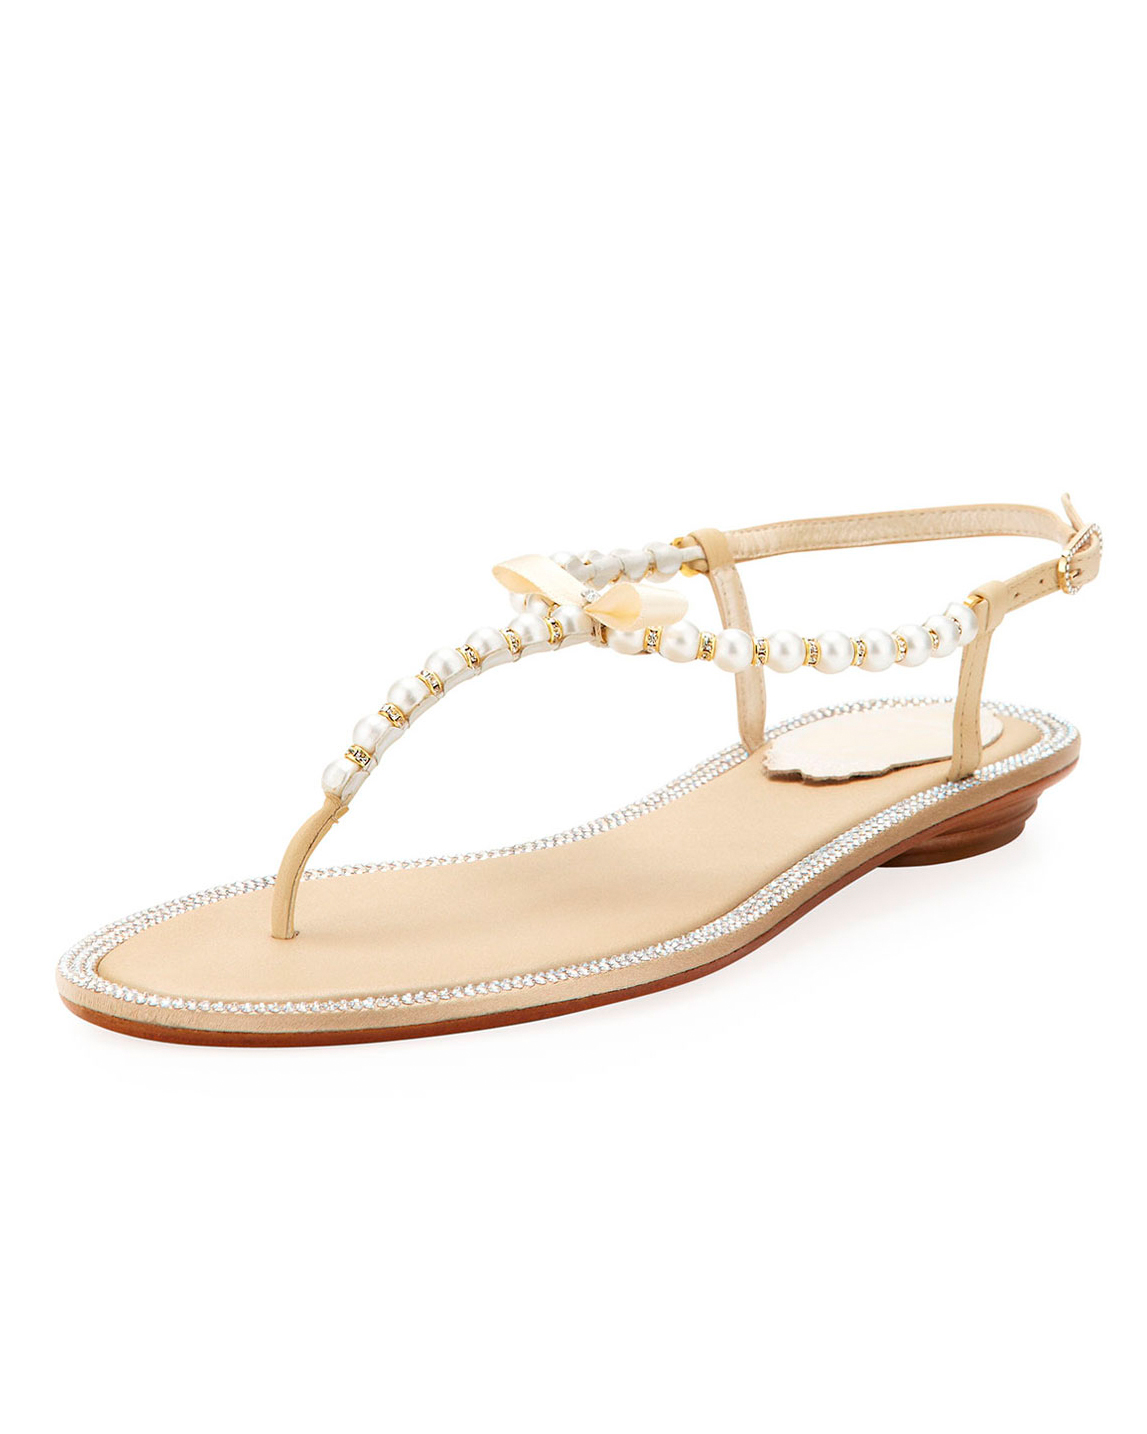 fall-wedding-shoes-rene-caovilla-sandal-0914.jpg